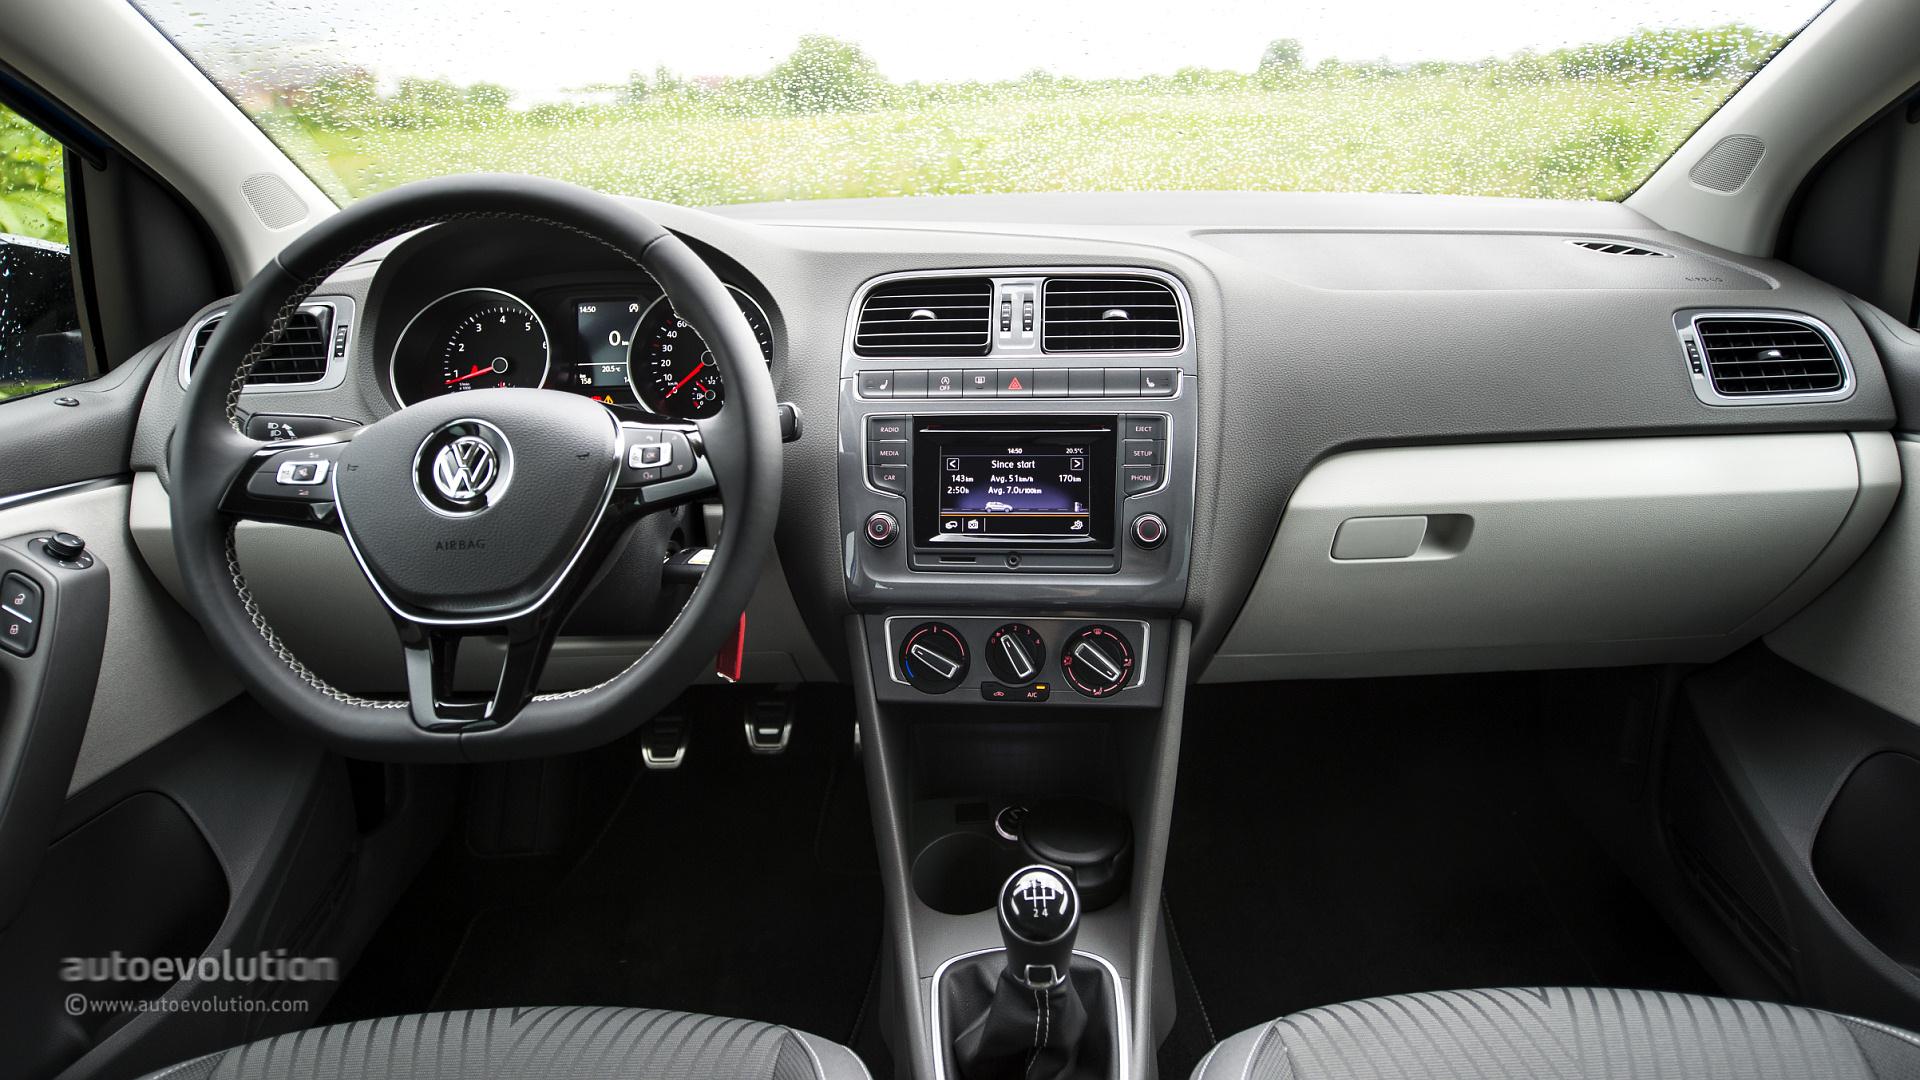 2014 volkswagen polo 1 2 tsi first drive autoevolution. Black Bedroom Furniture Sets. Home Design Ideas